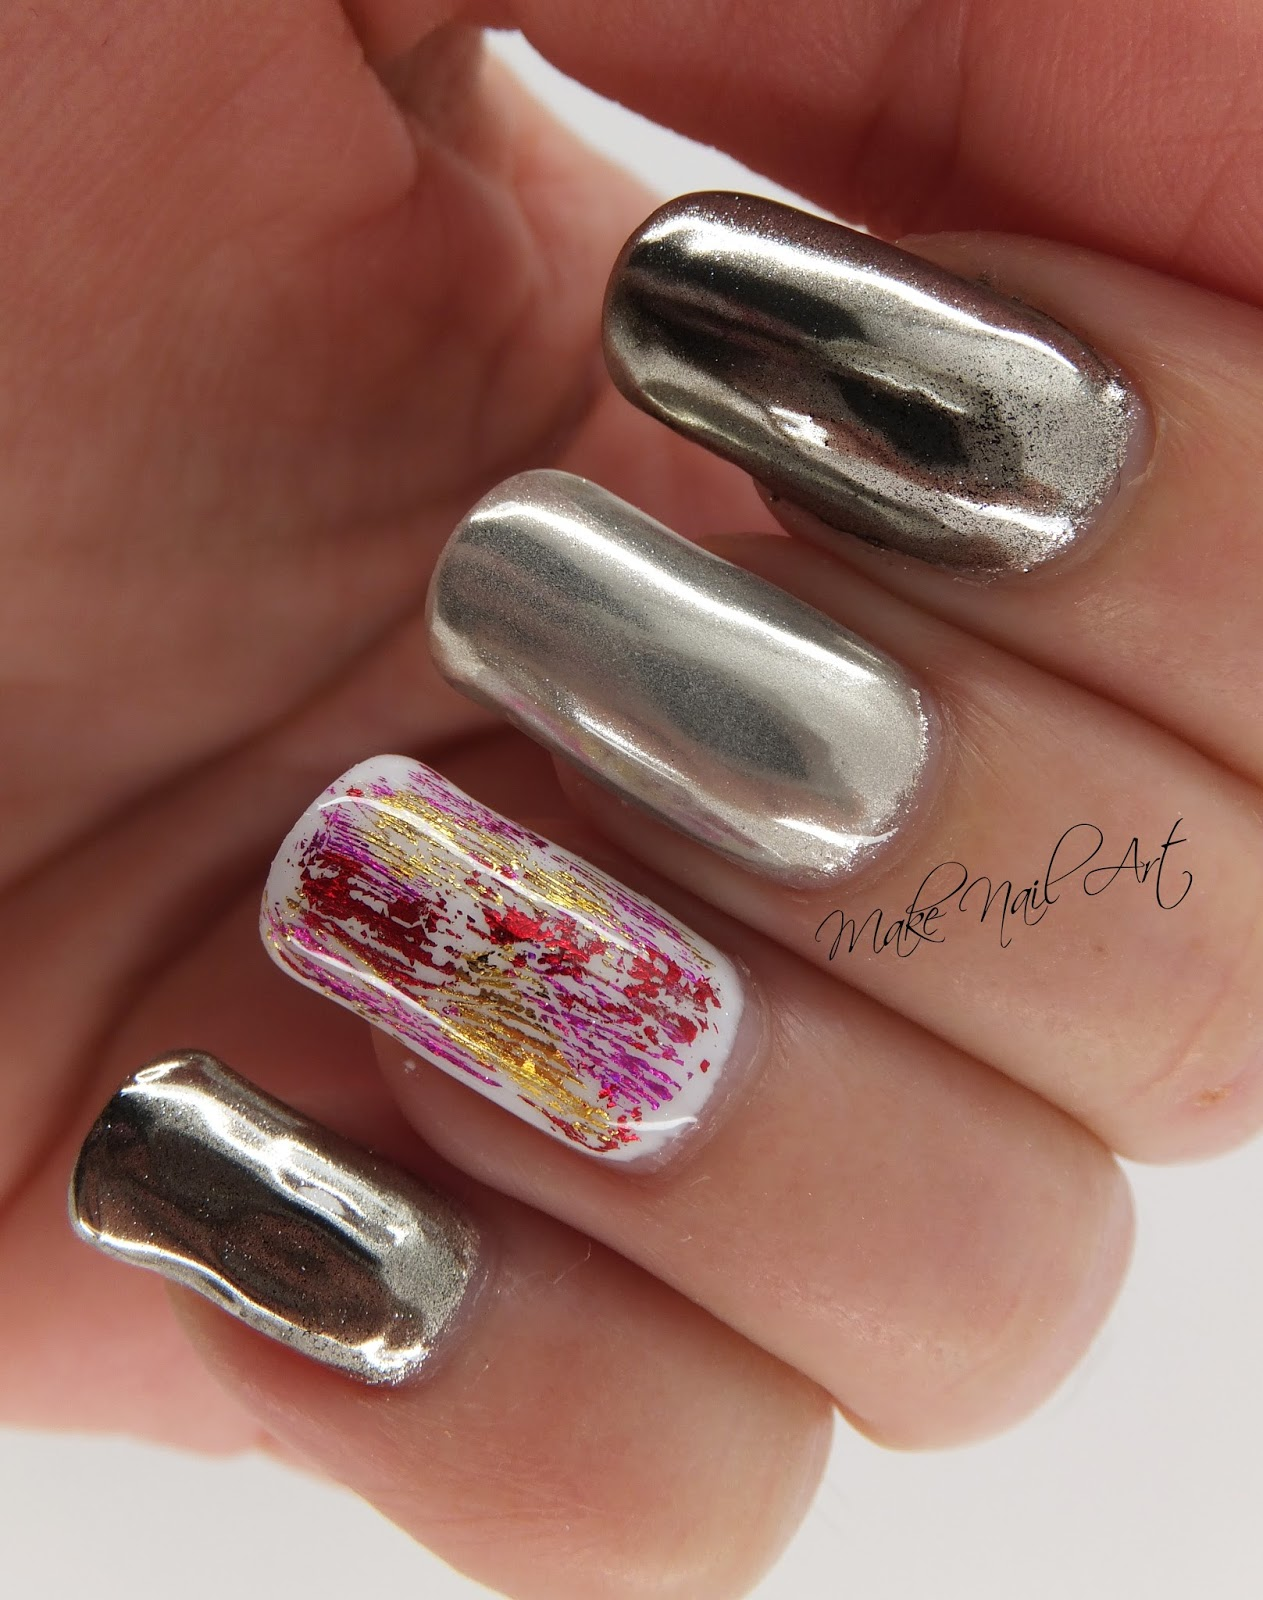 Mirror Powder And Foil Gel Polish Nails Nail Art Design Tutorial